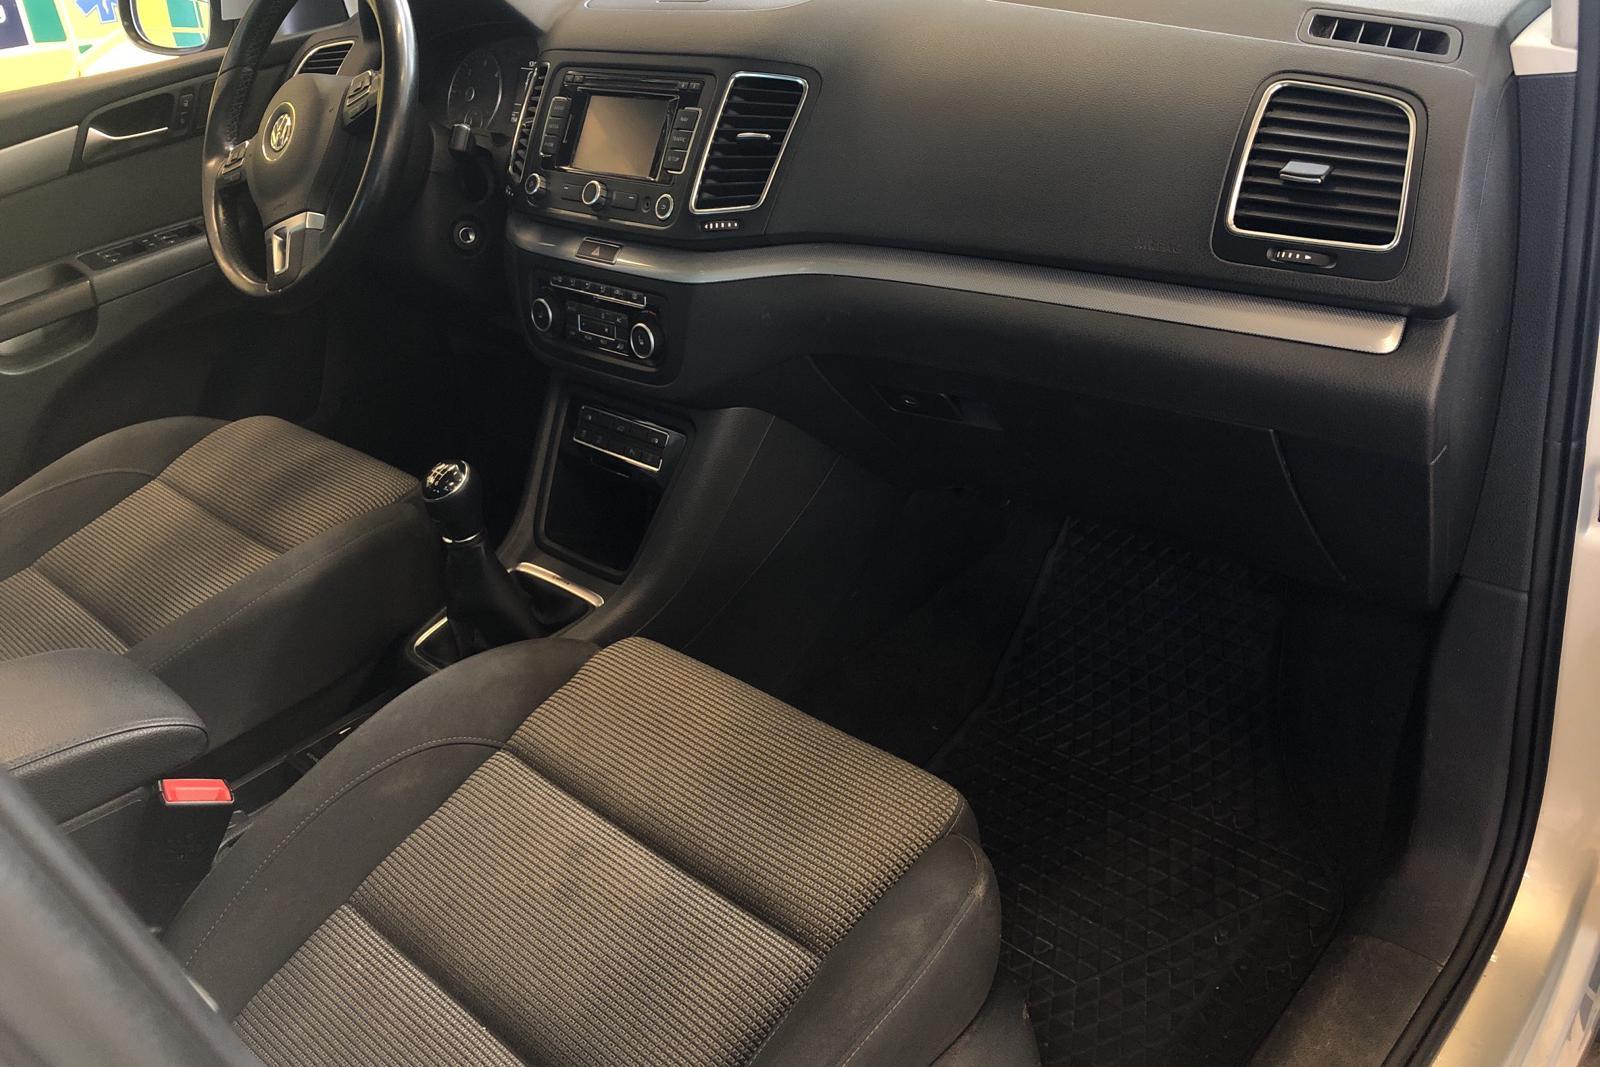 VW Sharan 2.0 TDI BlueMotion Technology 4motion (140hk) - 154 310 km - Manual - silver - 2012